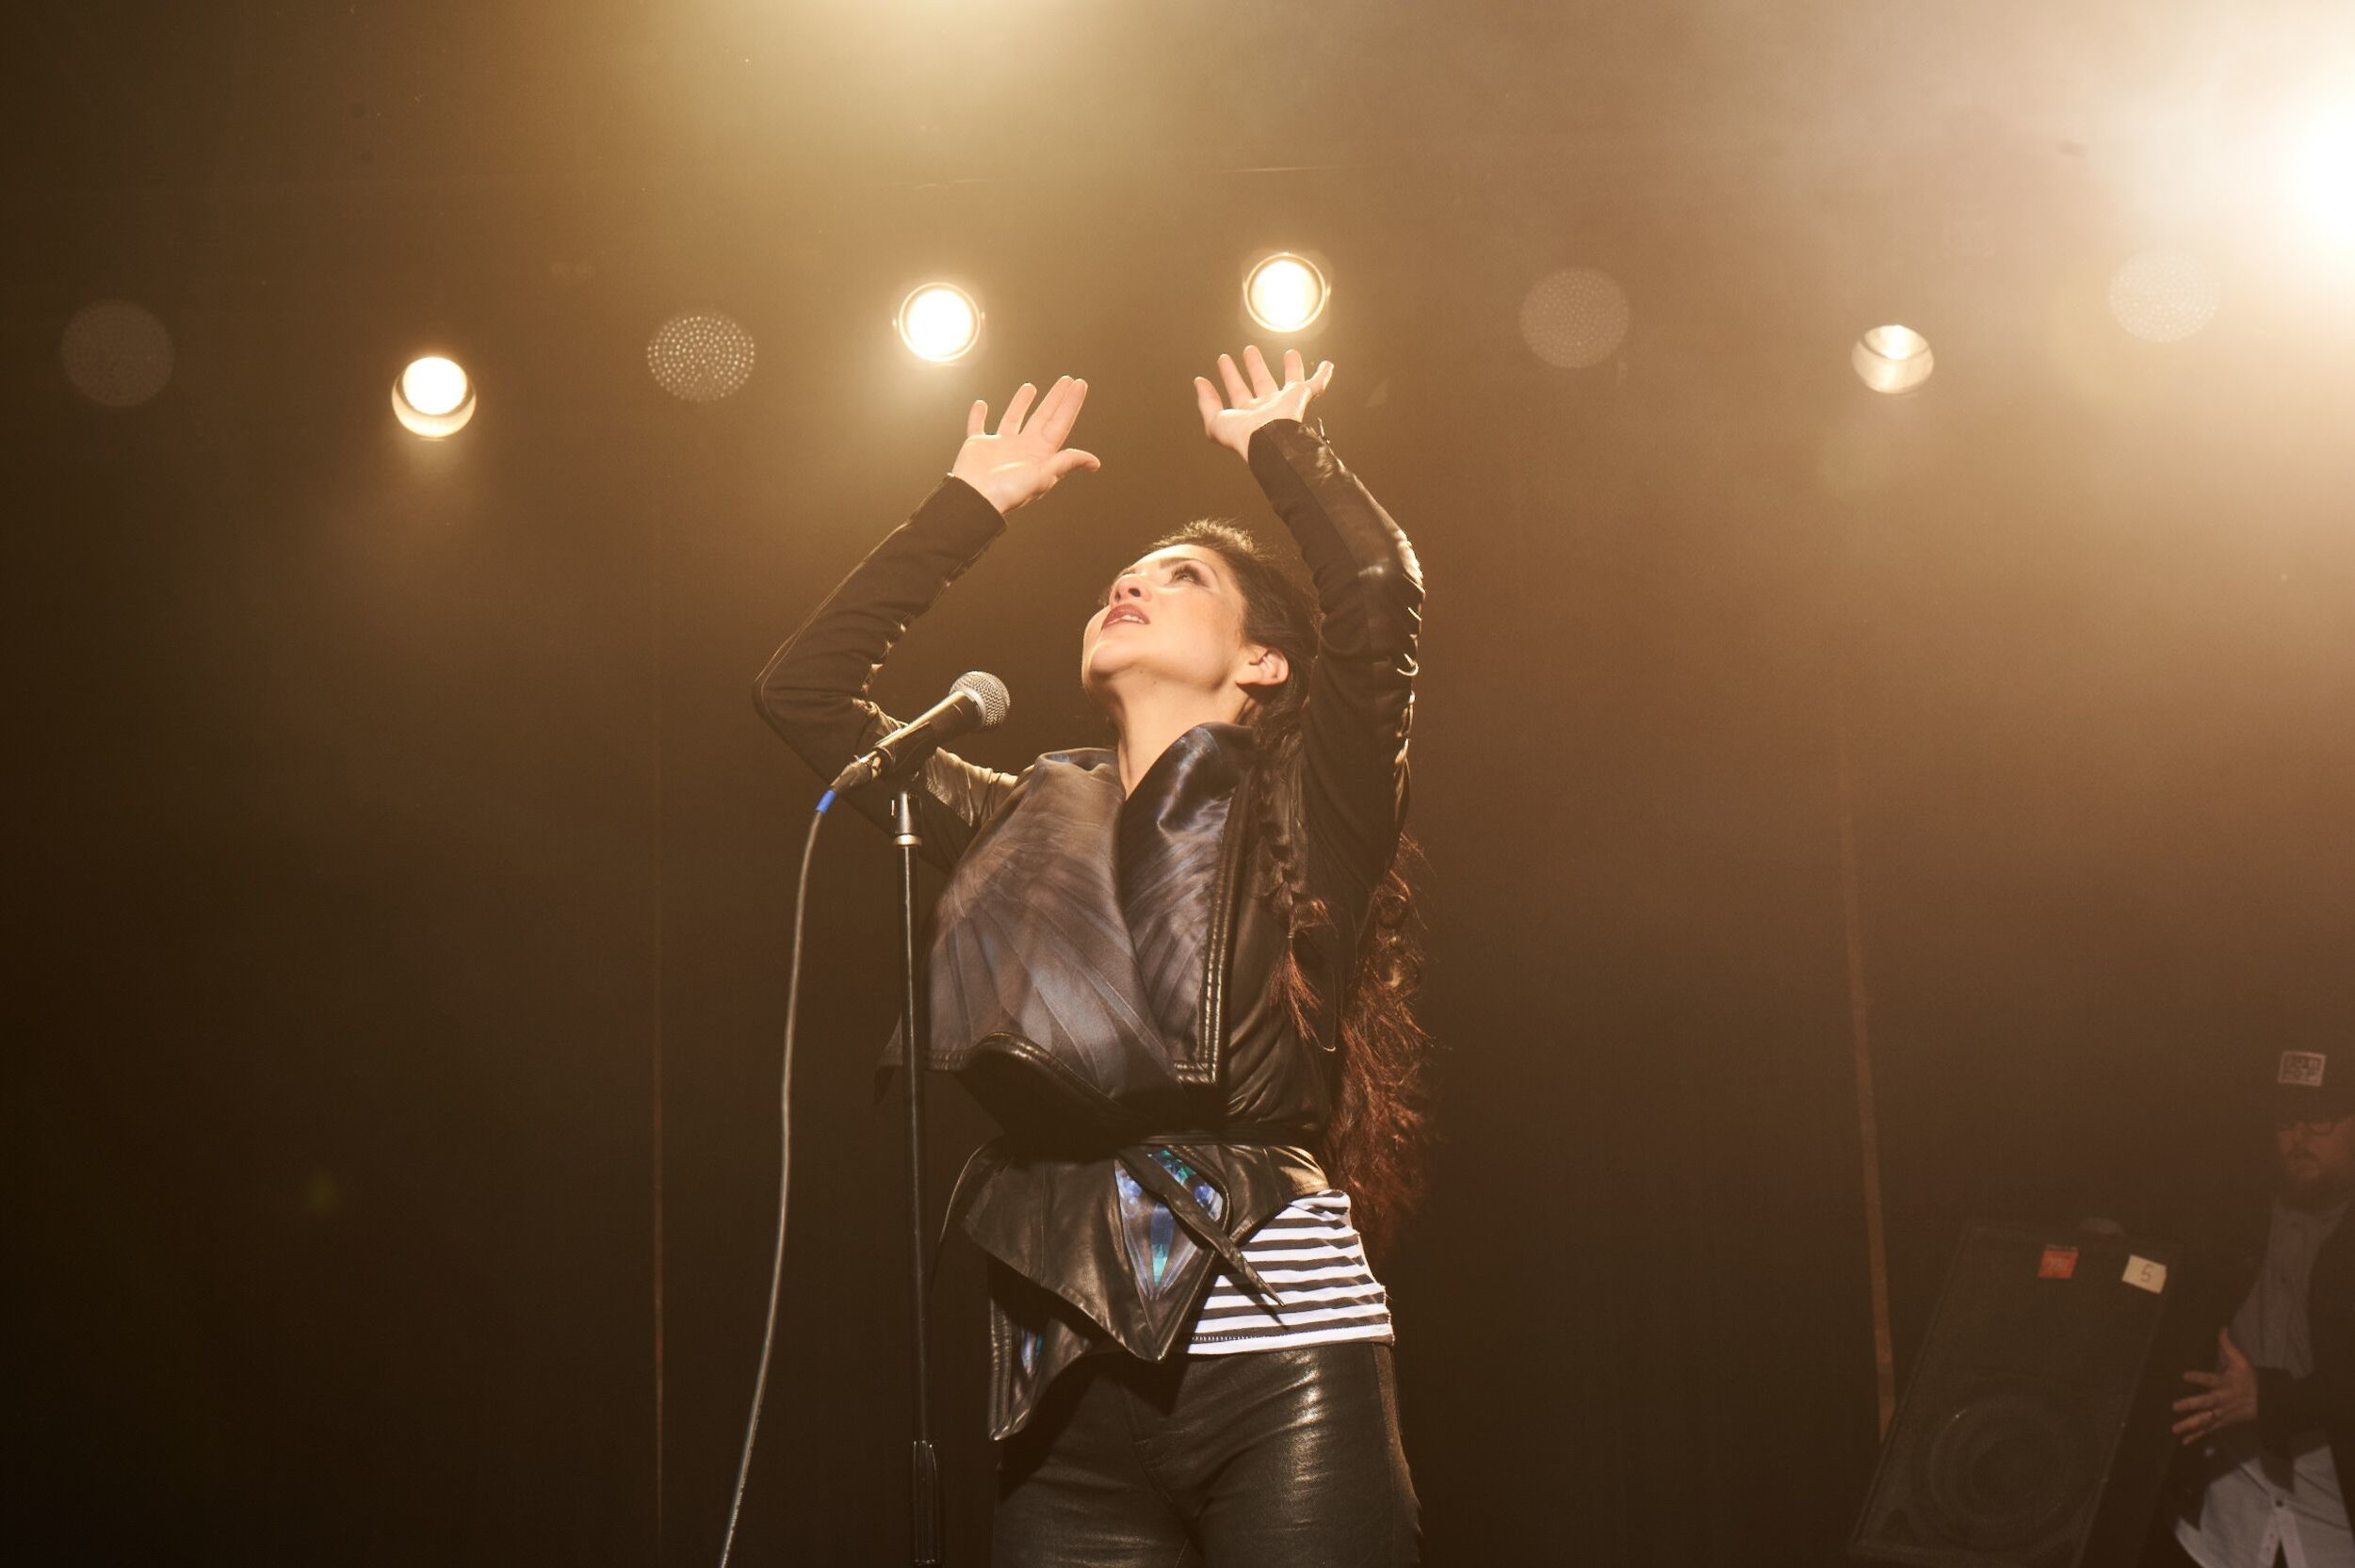 Jaci Velasquez performing at a concert. Photo by Allen Clark.